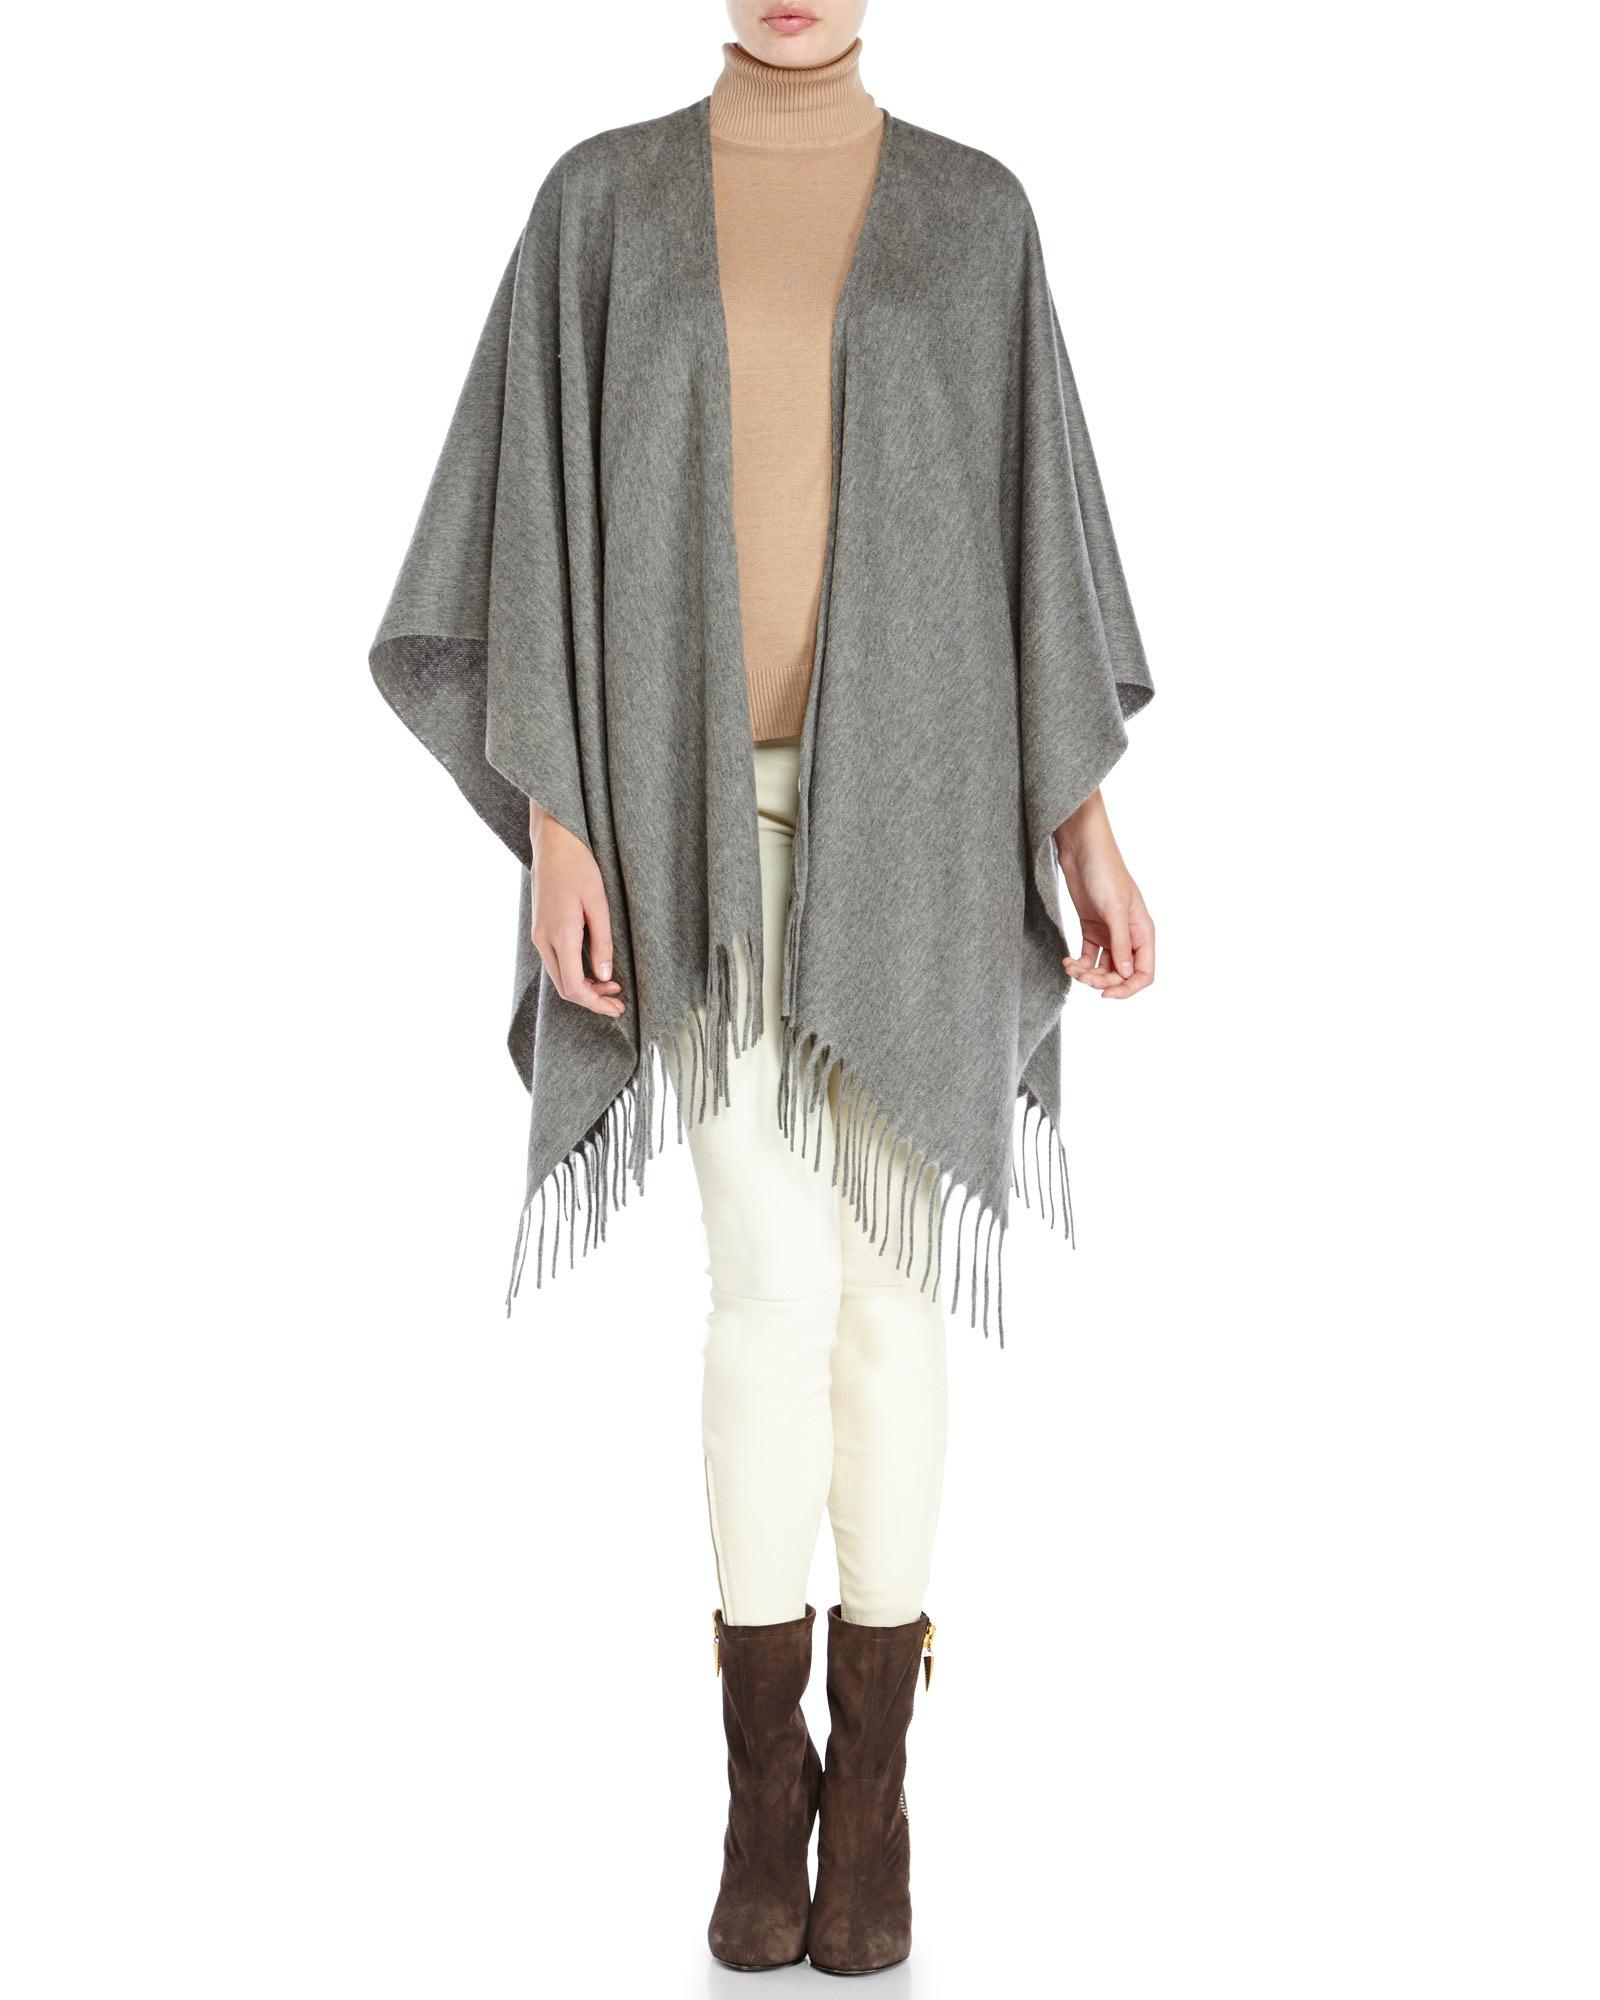 Portolano Ruana Fringe Trim Wool Shawl In Gray